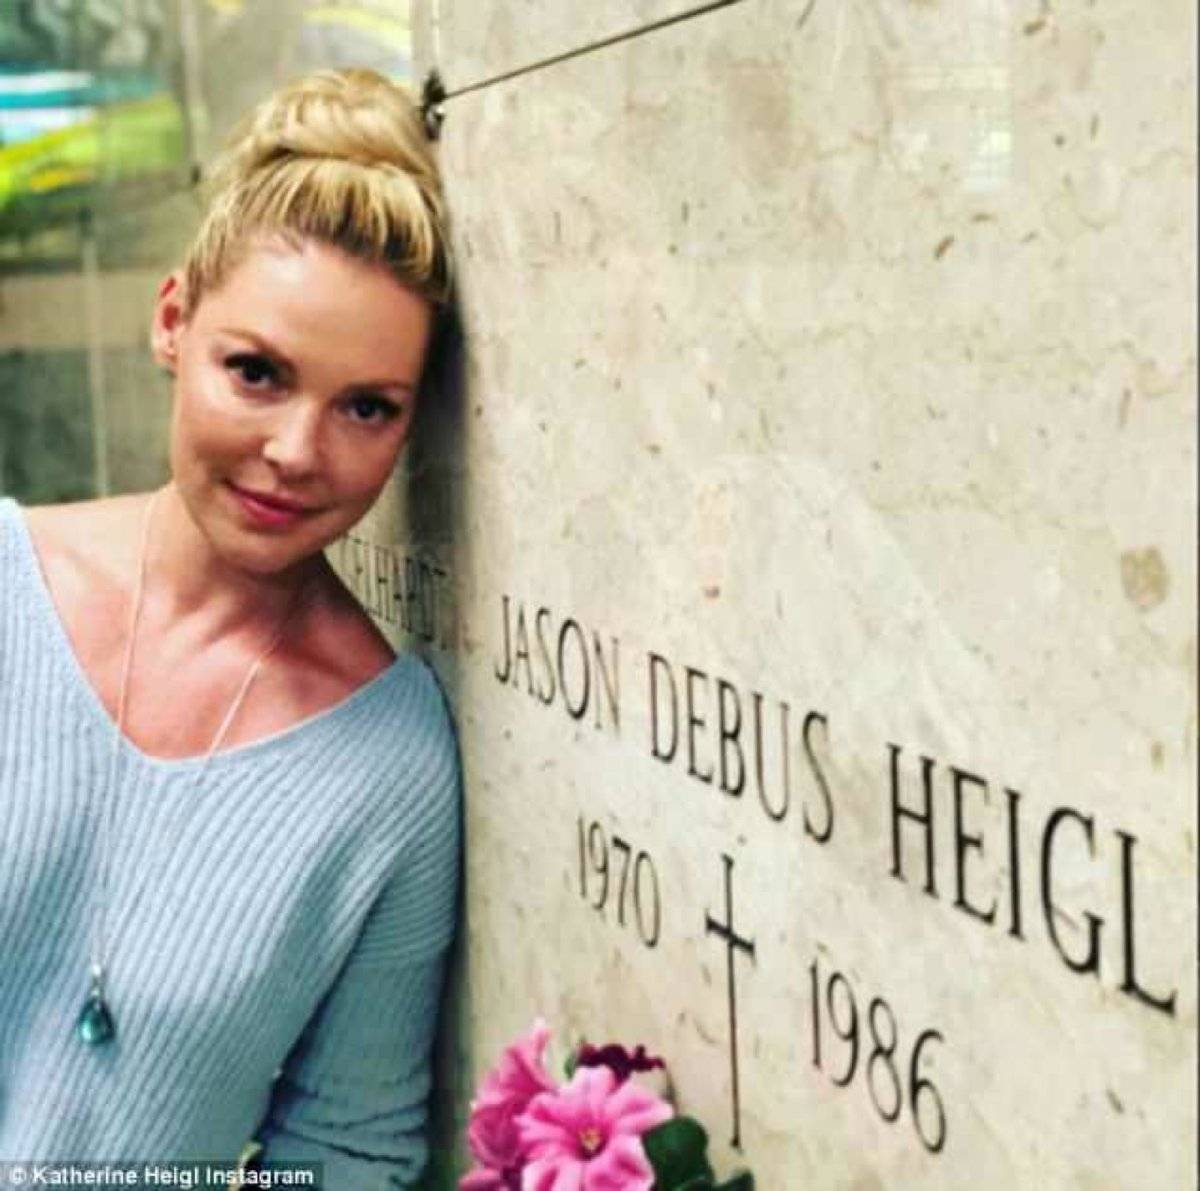 Katherine Heigl cementerio